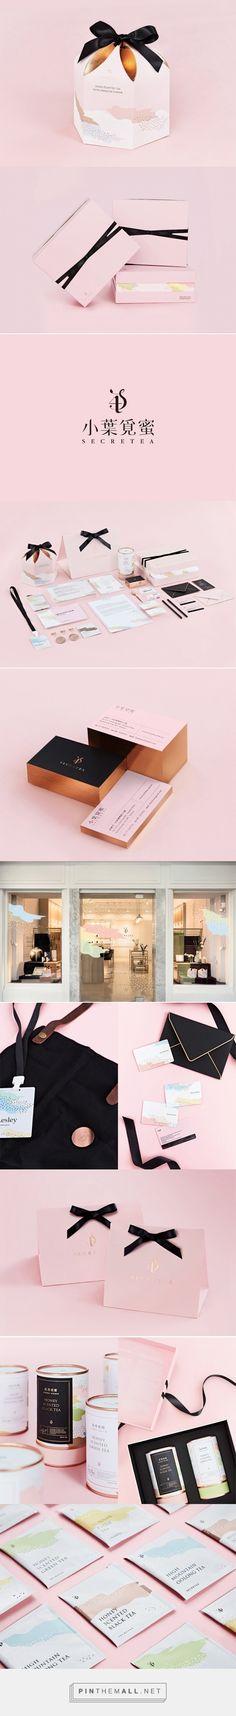 Secretea on Packaging of the World. Tea packaging and branding design